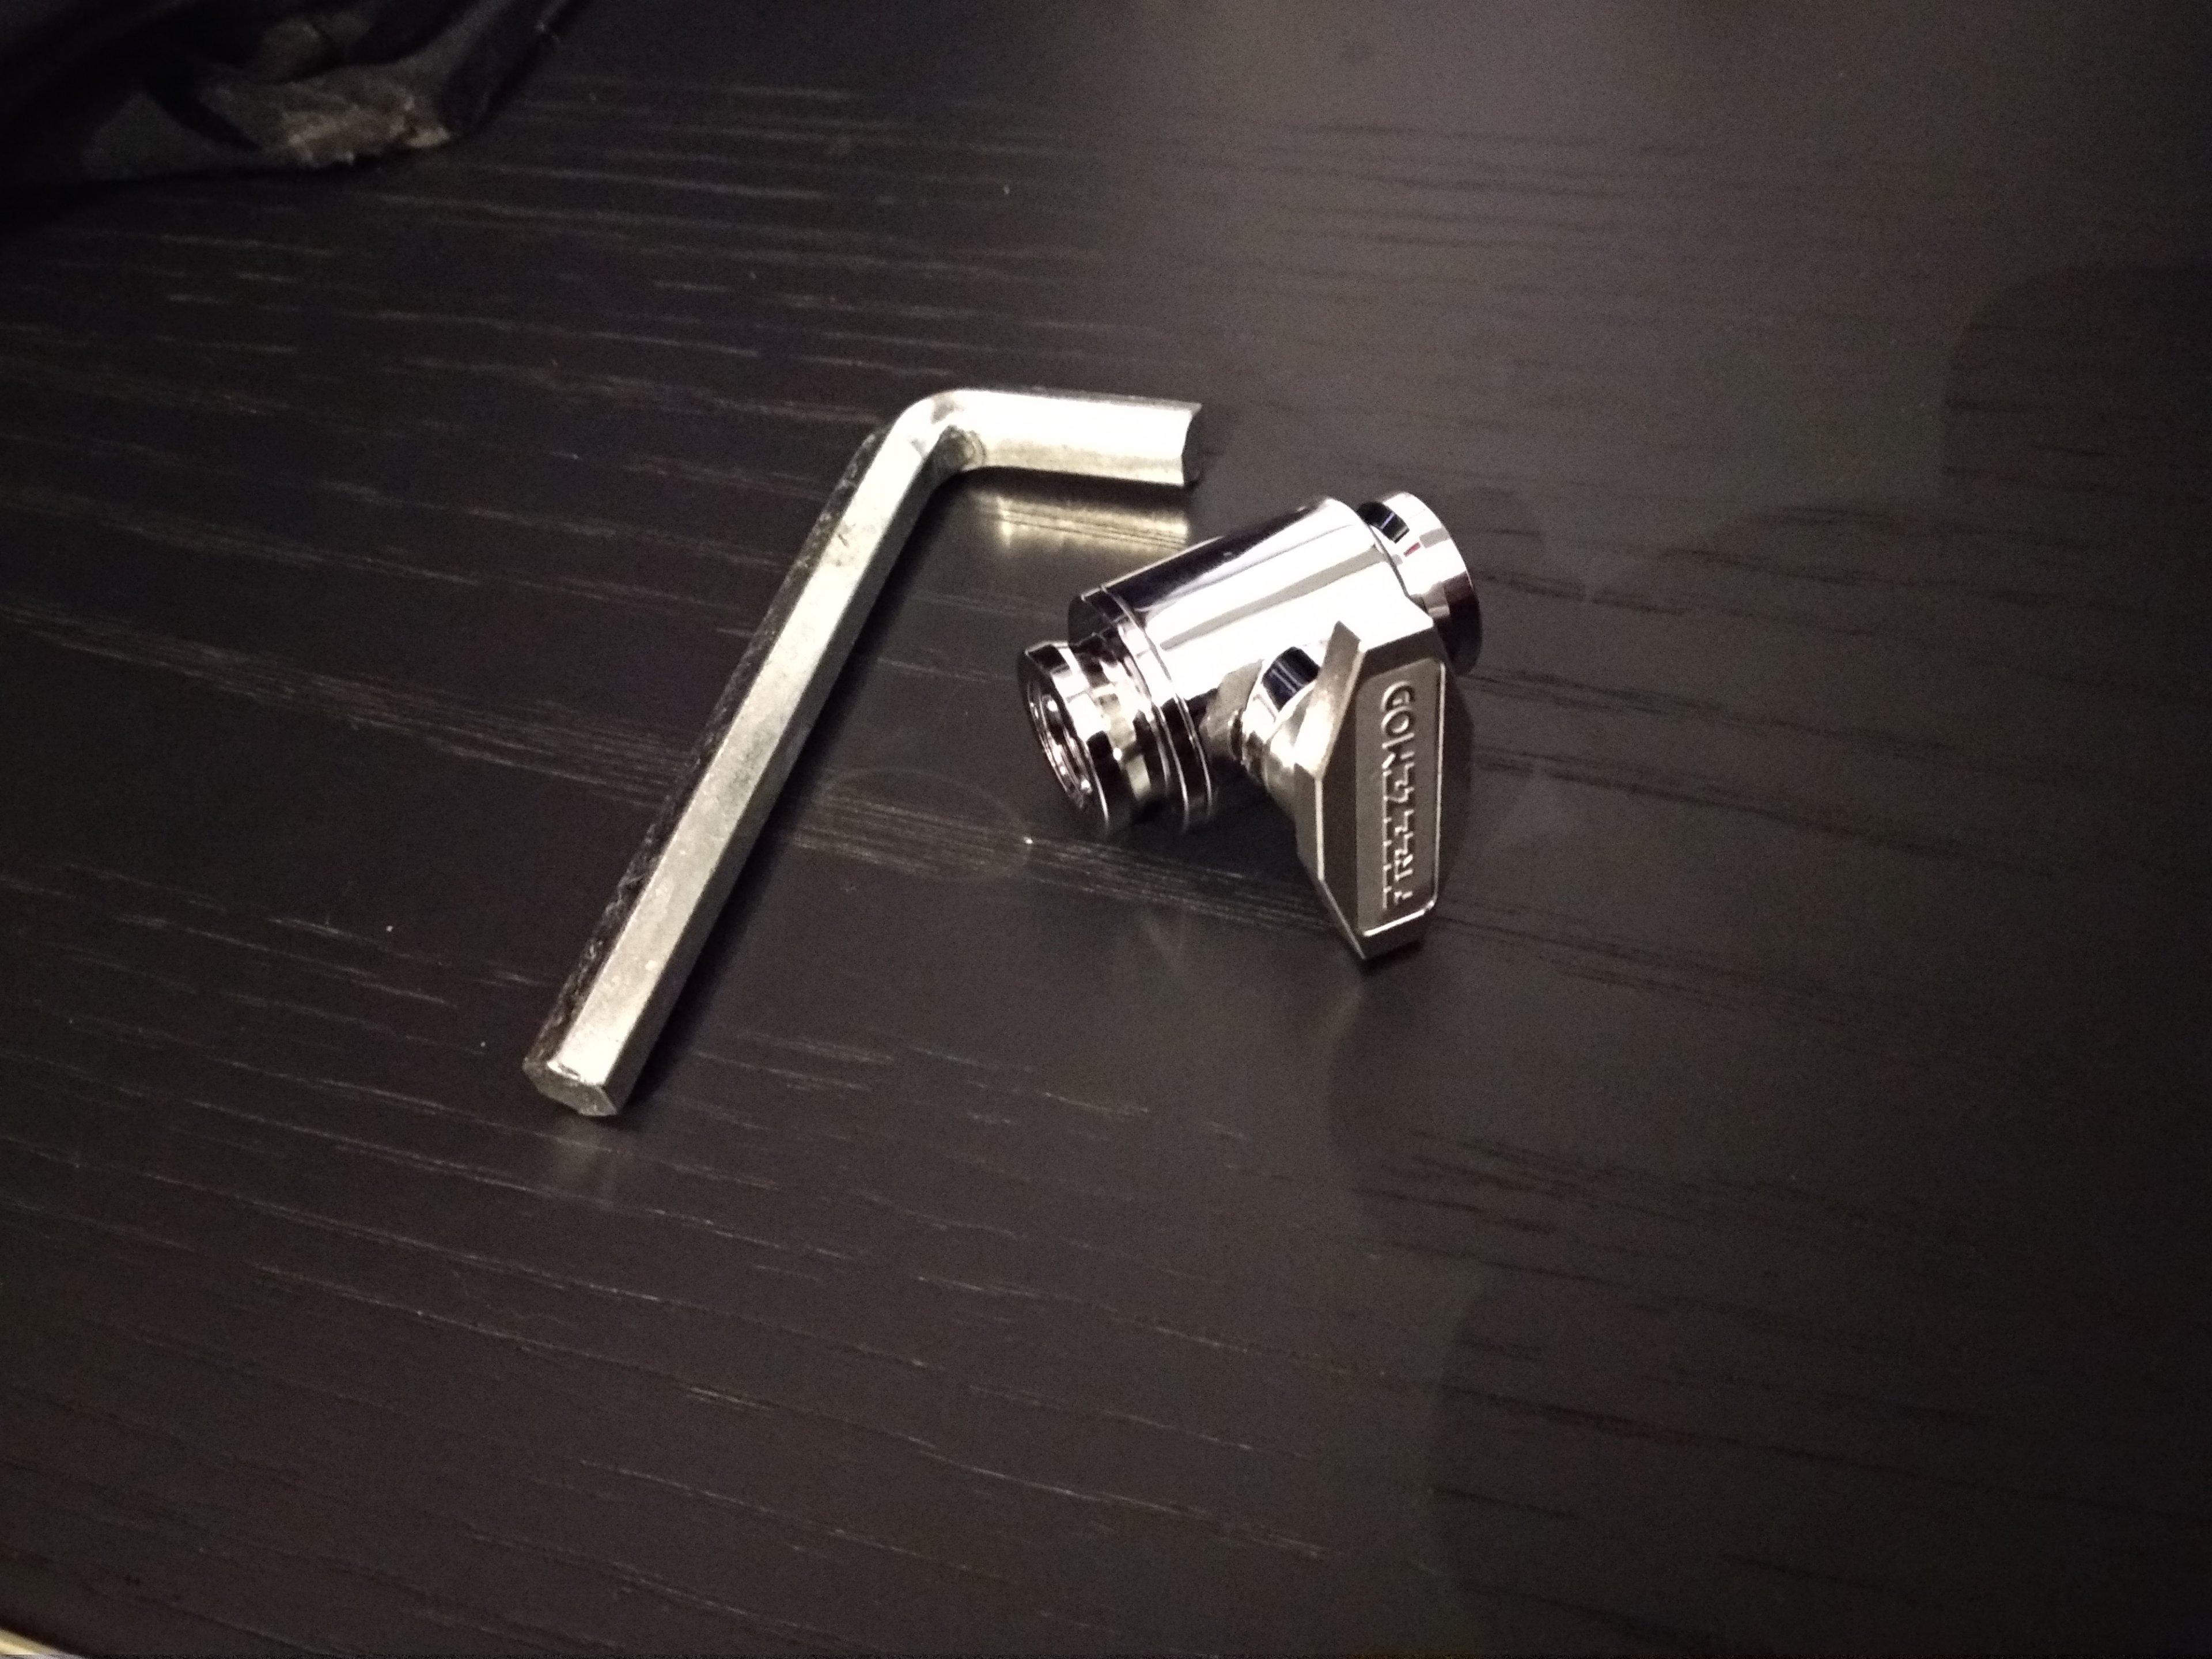 Verschlusshahn & Sechskantschlüssel.jpg